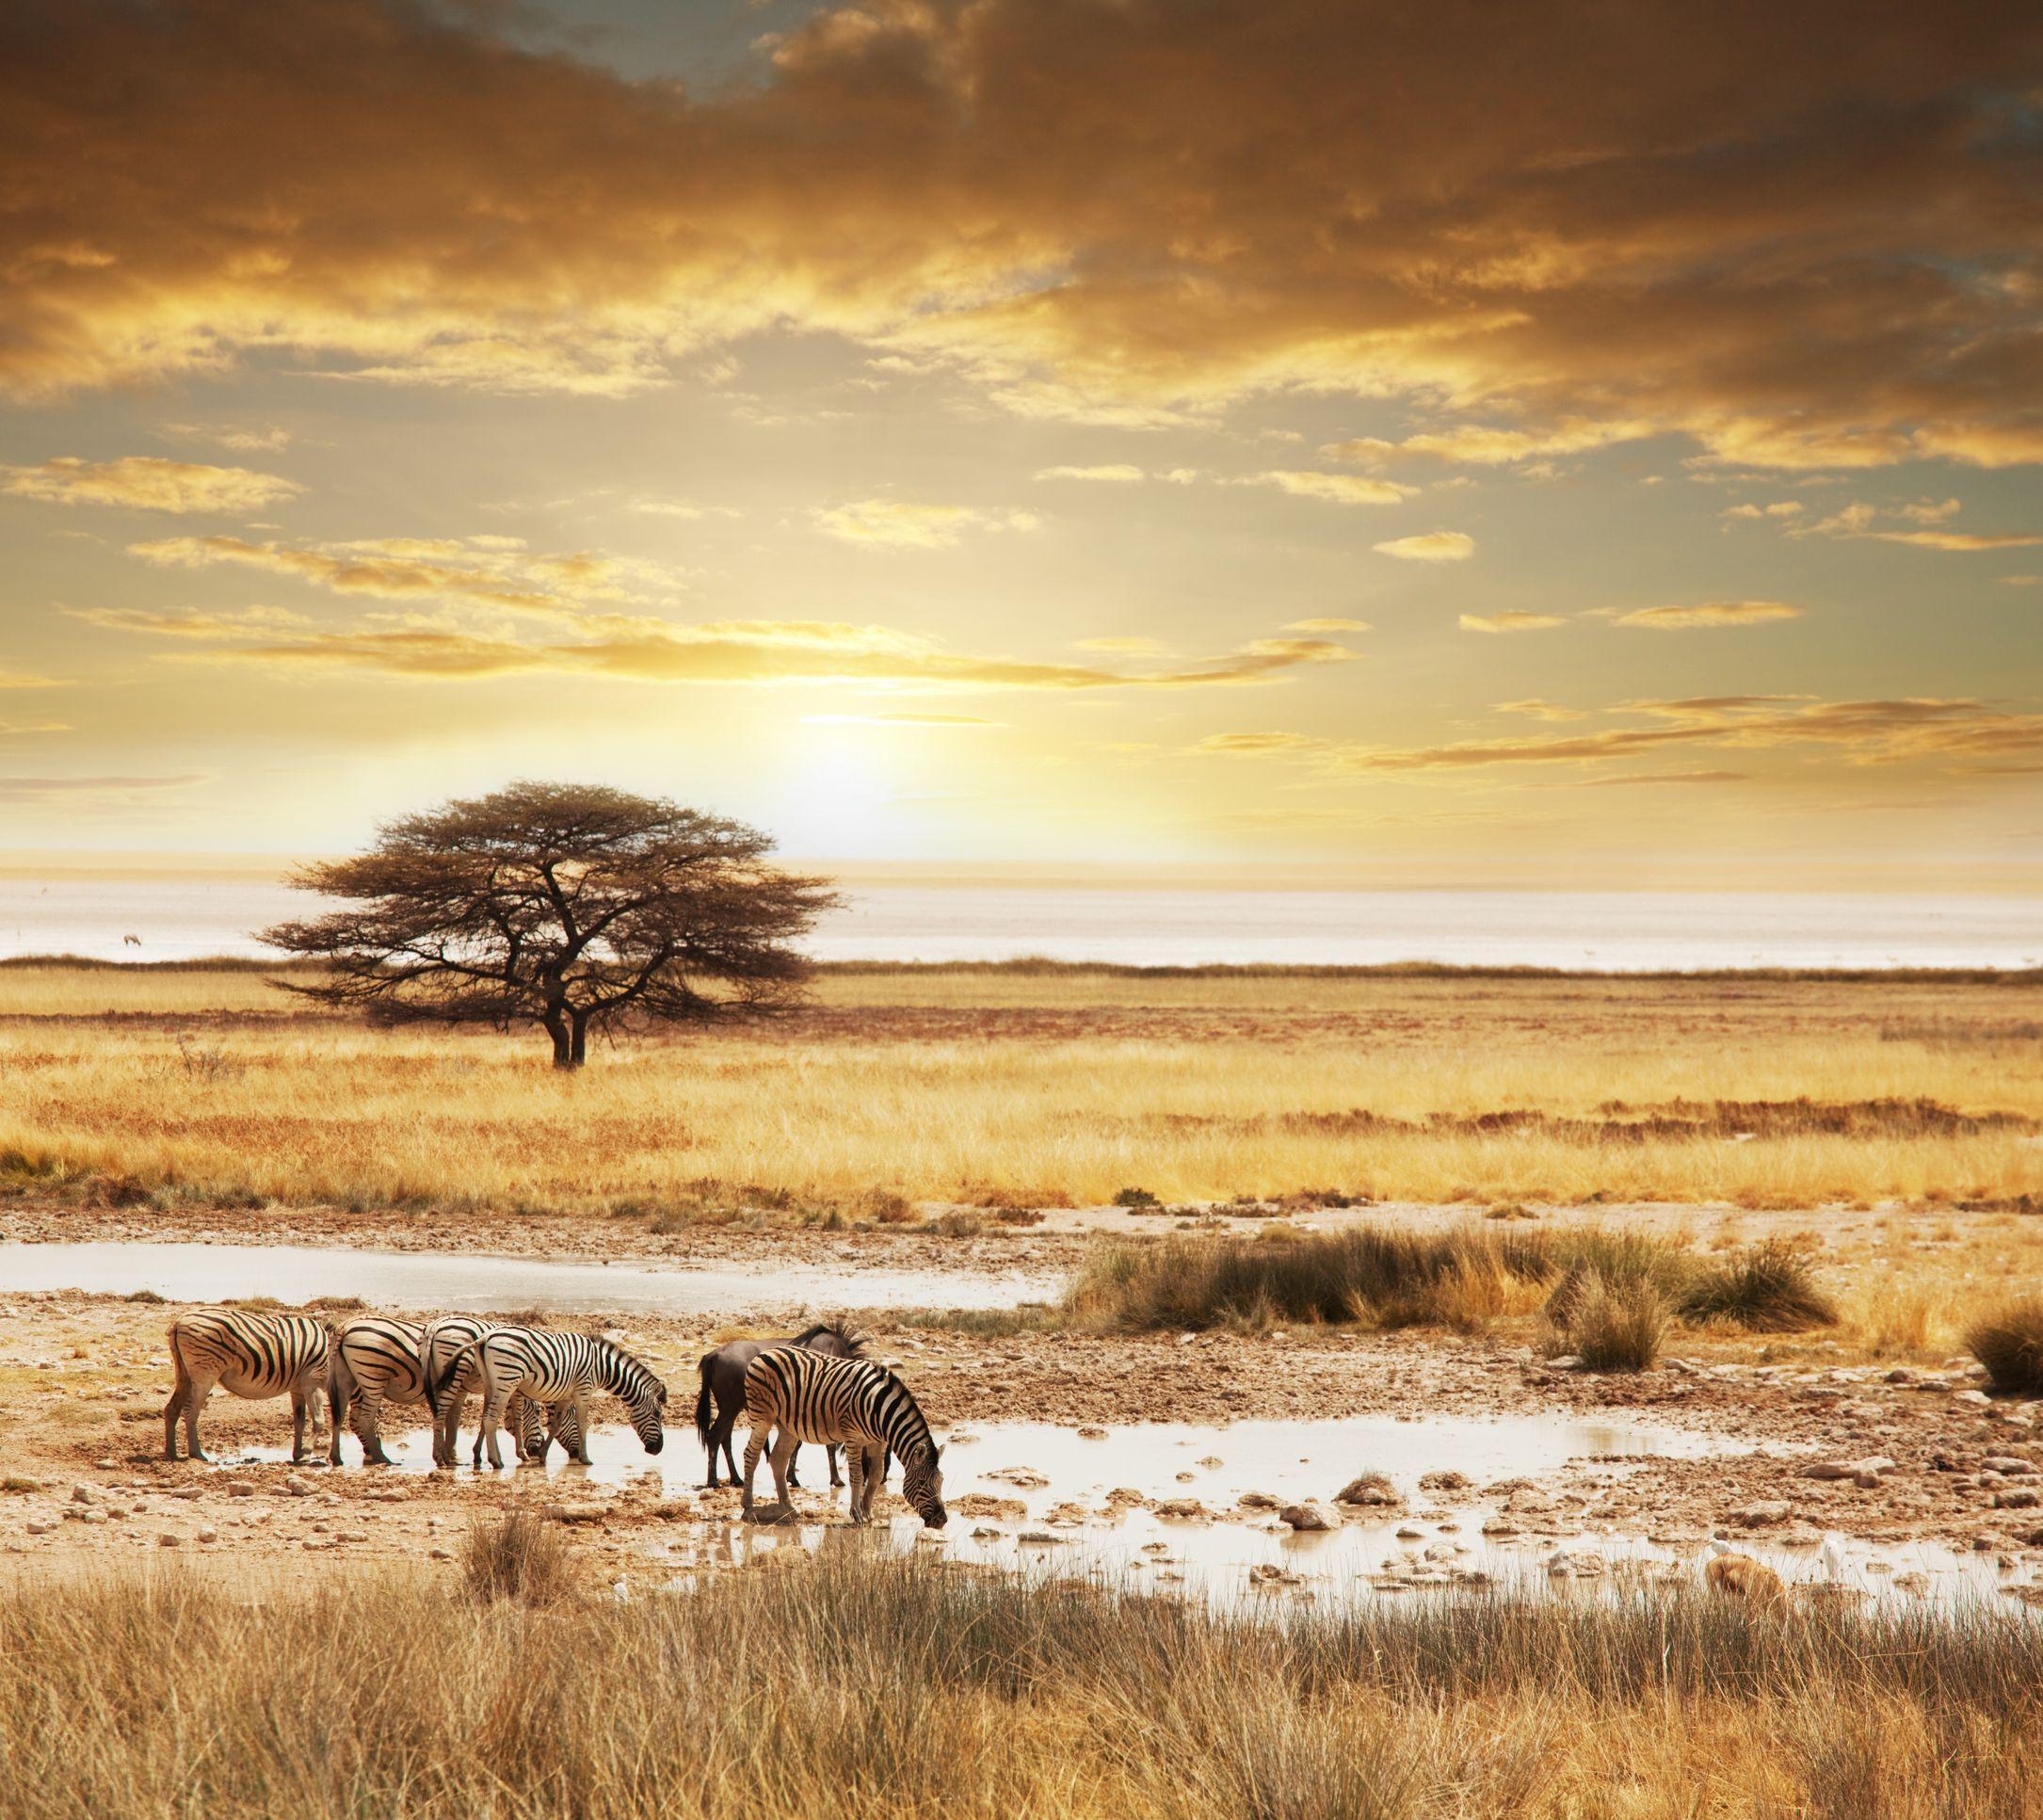 Cebras sabana africana